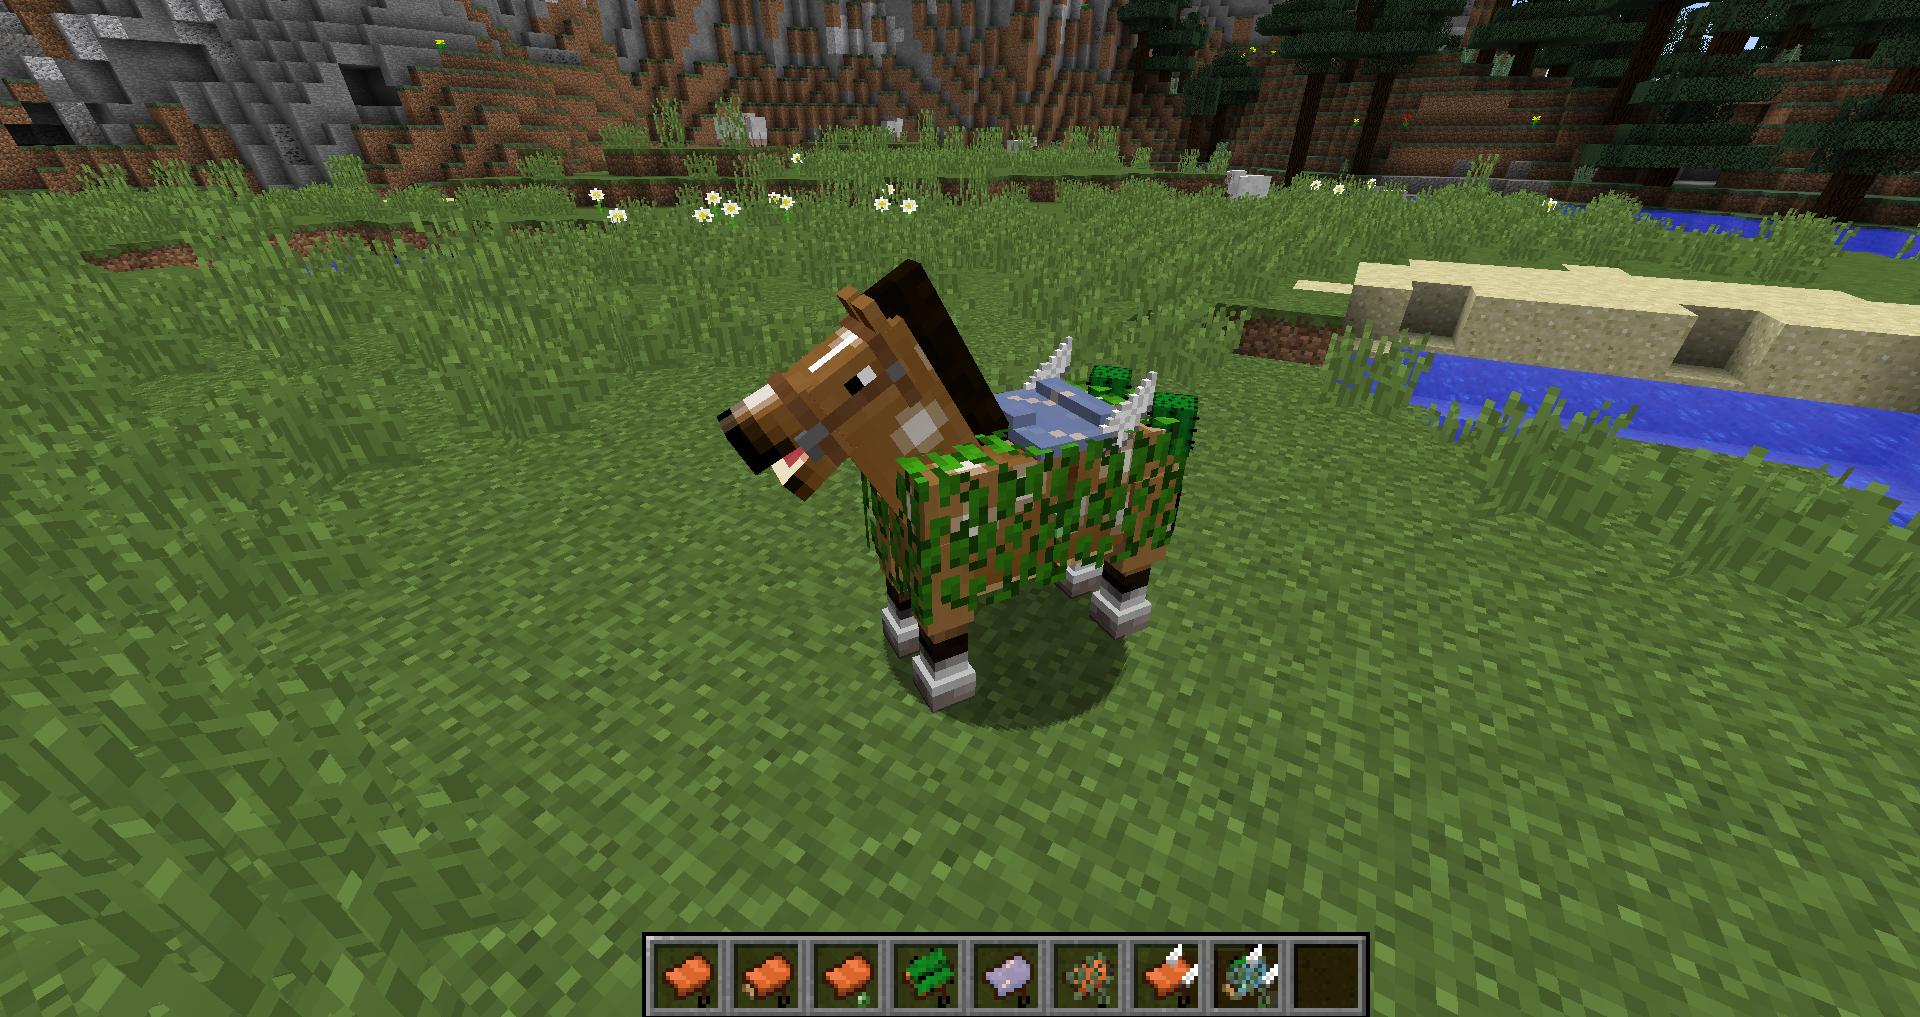 моды для майнкрафт с лошадьми 1.11.2 #4